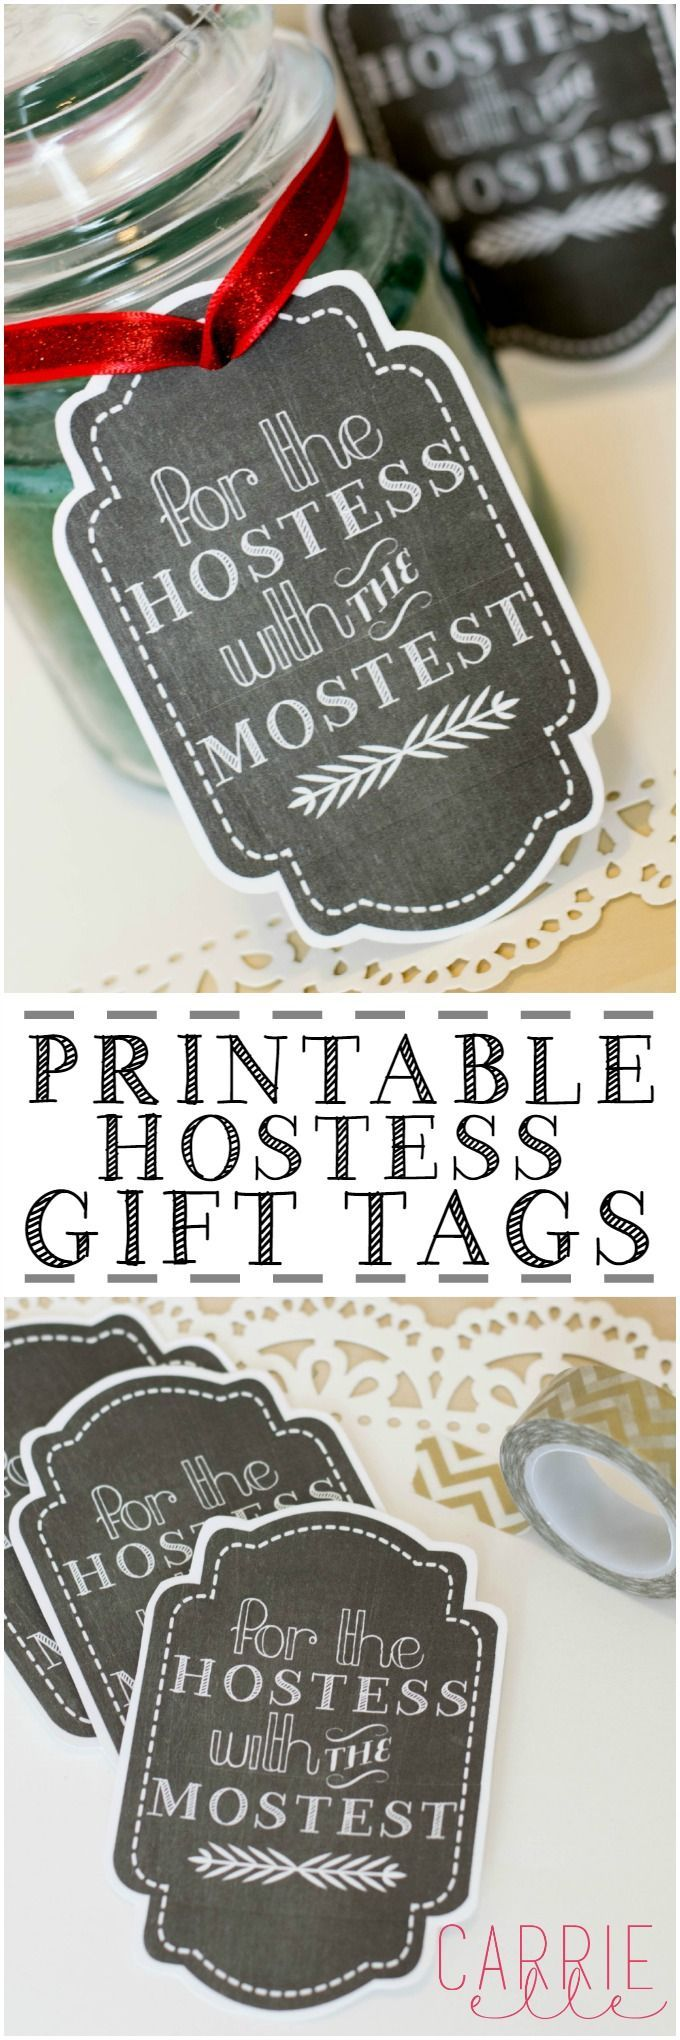 Free printable gift tags hostess gift tag diy ideas pinterest free printable gift tags hostess gift tag negle Choice Image